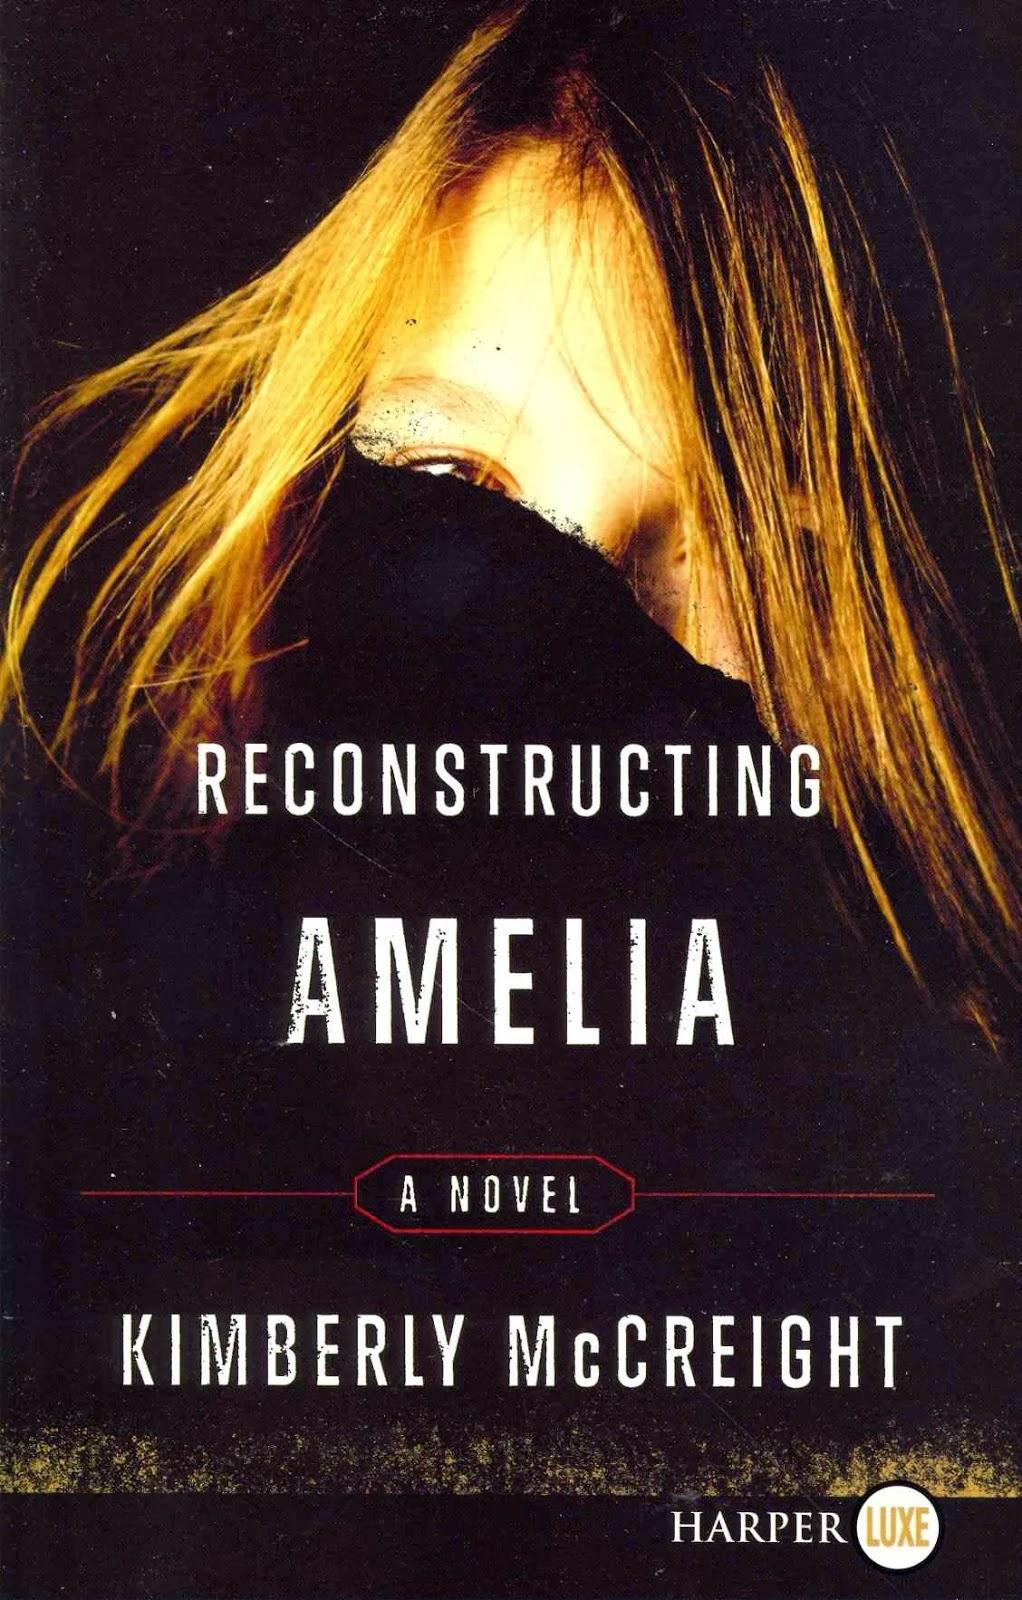 http://discover.halifaxpubliclibraries.ca/?q=title:reconstructing%20amelia